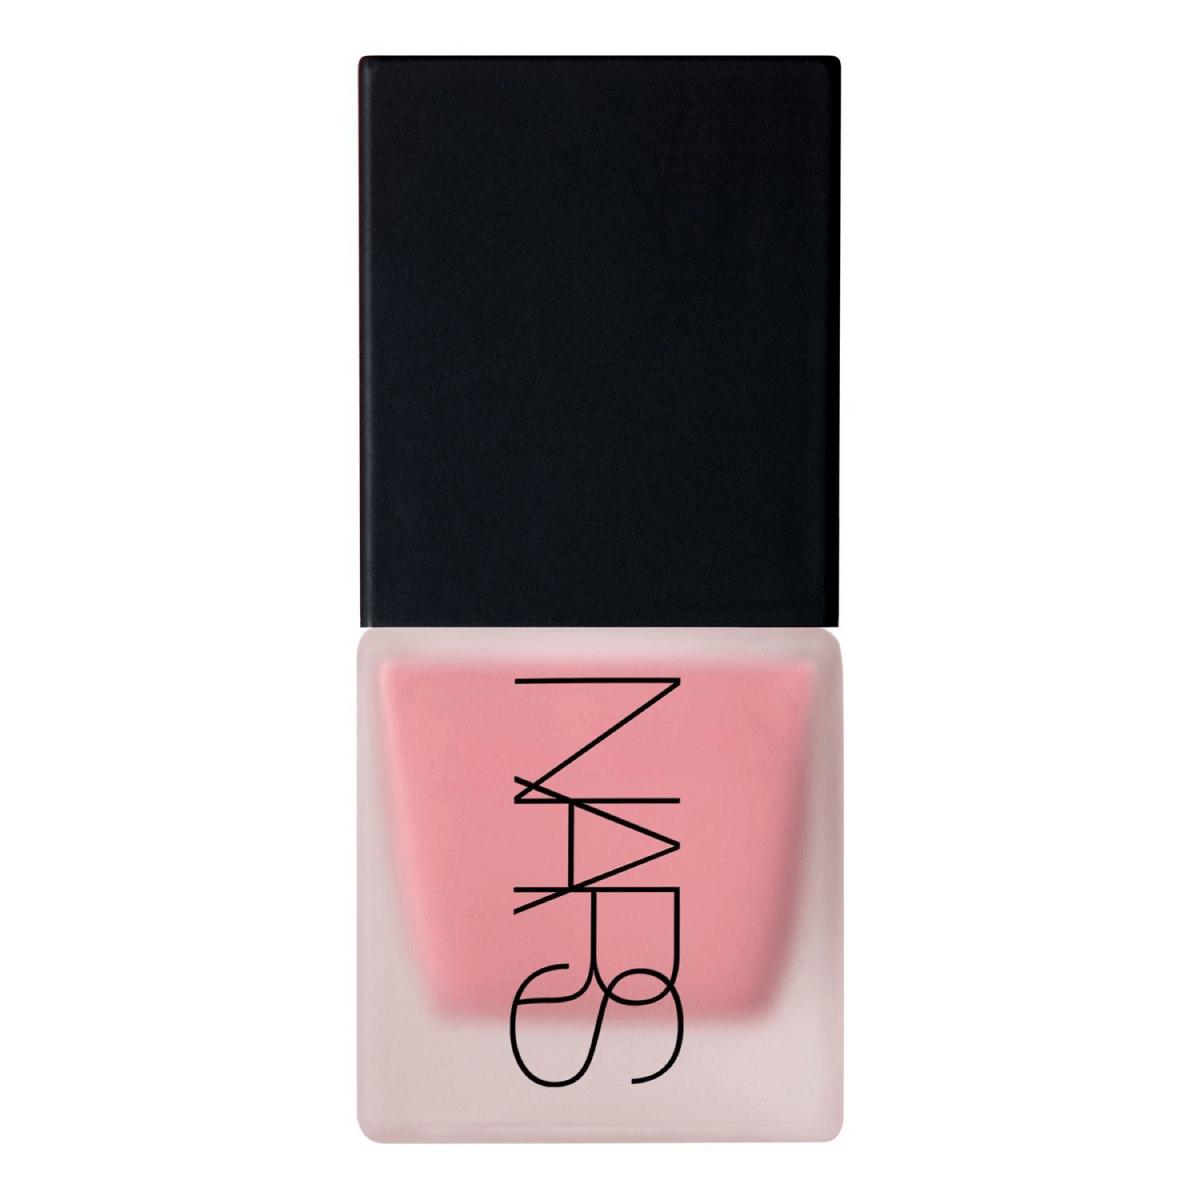 blush-liquide-orgasm-rouge-a-levres-illuminateur-highlighter-rosegold-nars-sephora-makeupbyazadig